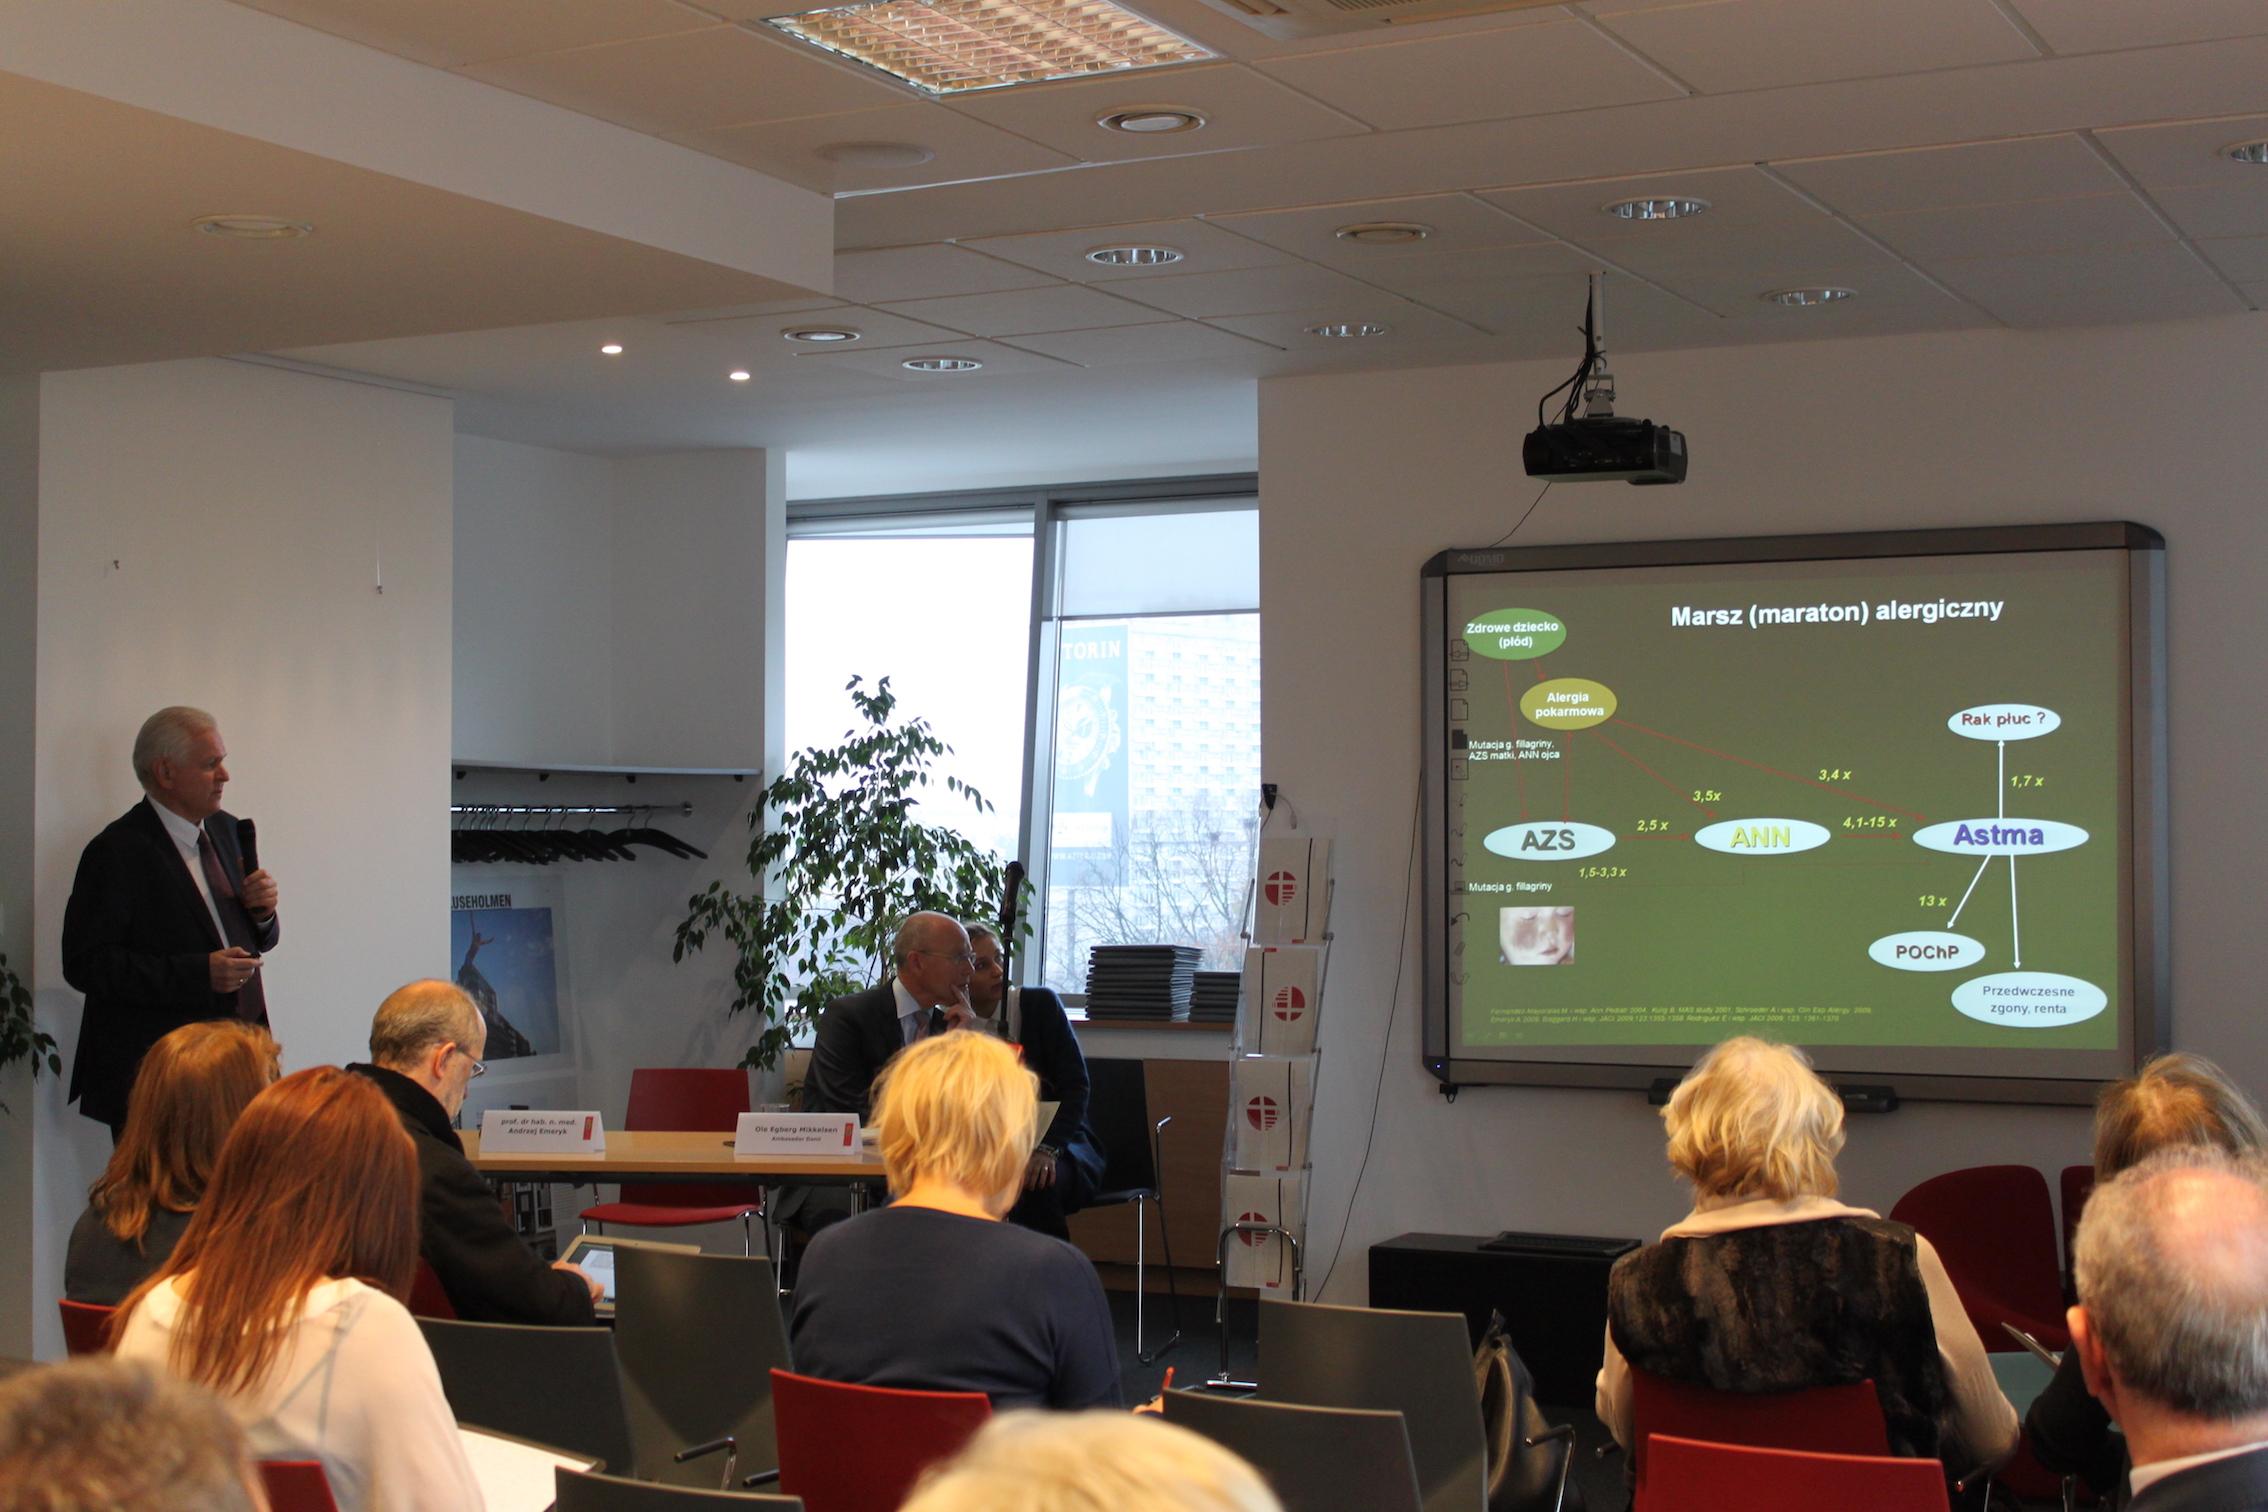 3-hipoalergiczni-ambasada-krolestwa-danii-immunoterapia-alergenowa-fot-michal-nowicki-press-conference-audience